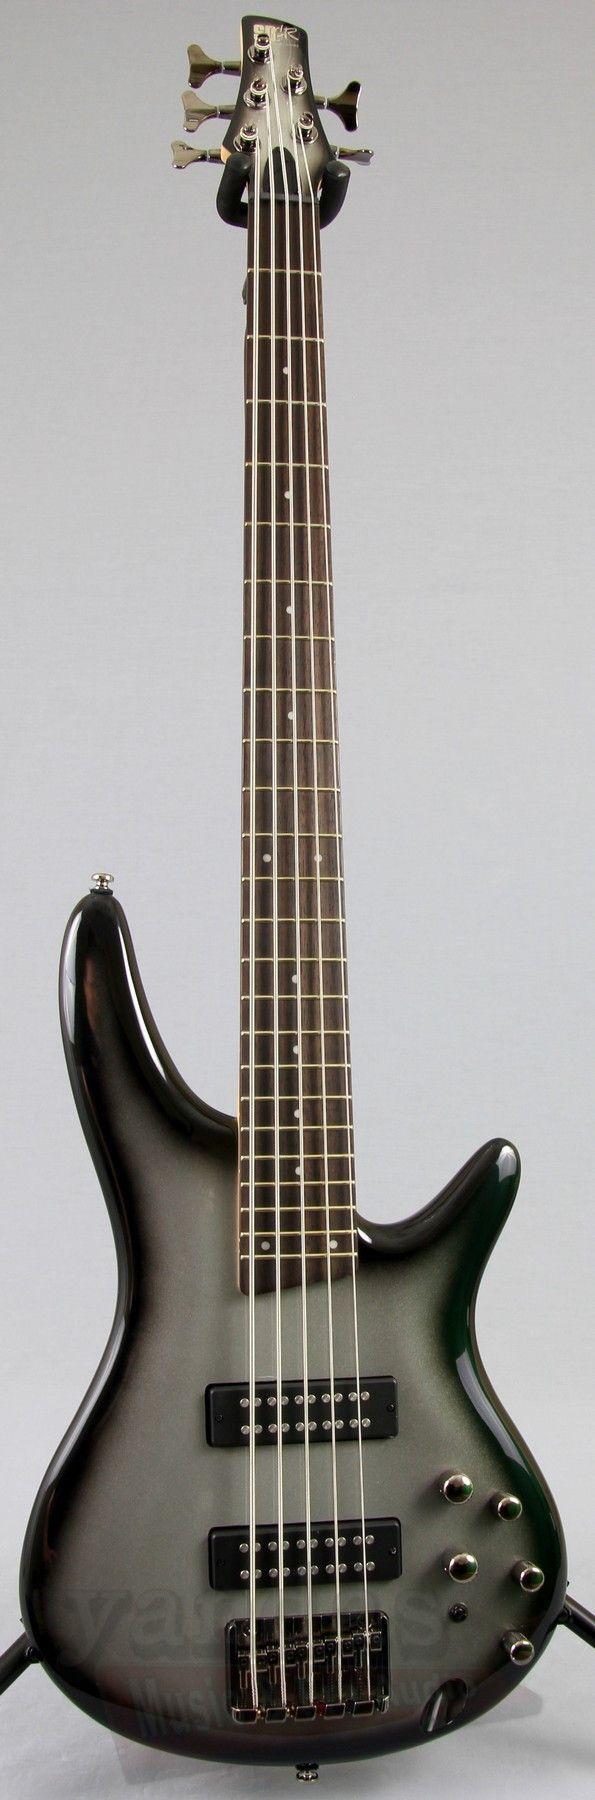 ibanez sr305e 5 string bass guitar iron pewter. Black Bedroom Furniture Sets. Home Design Ideas